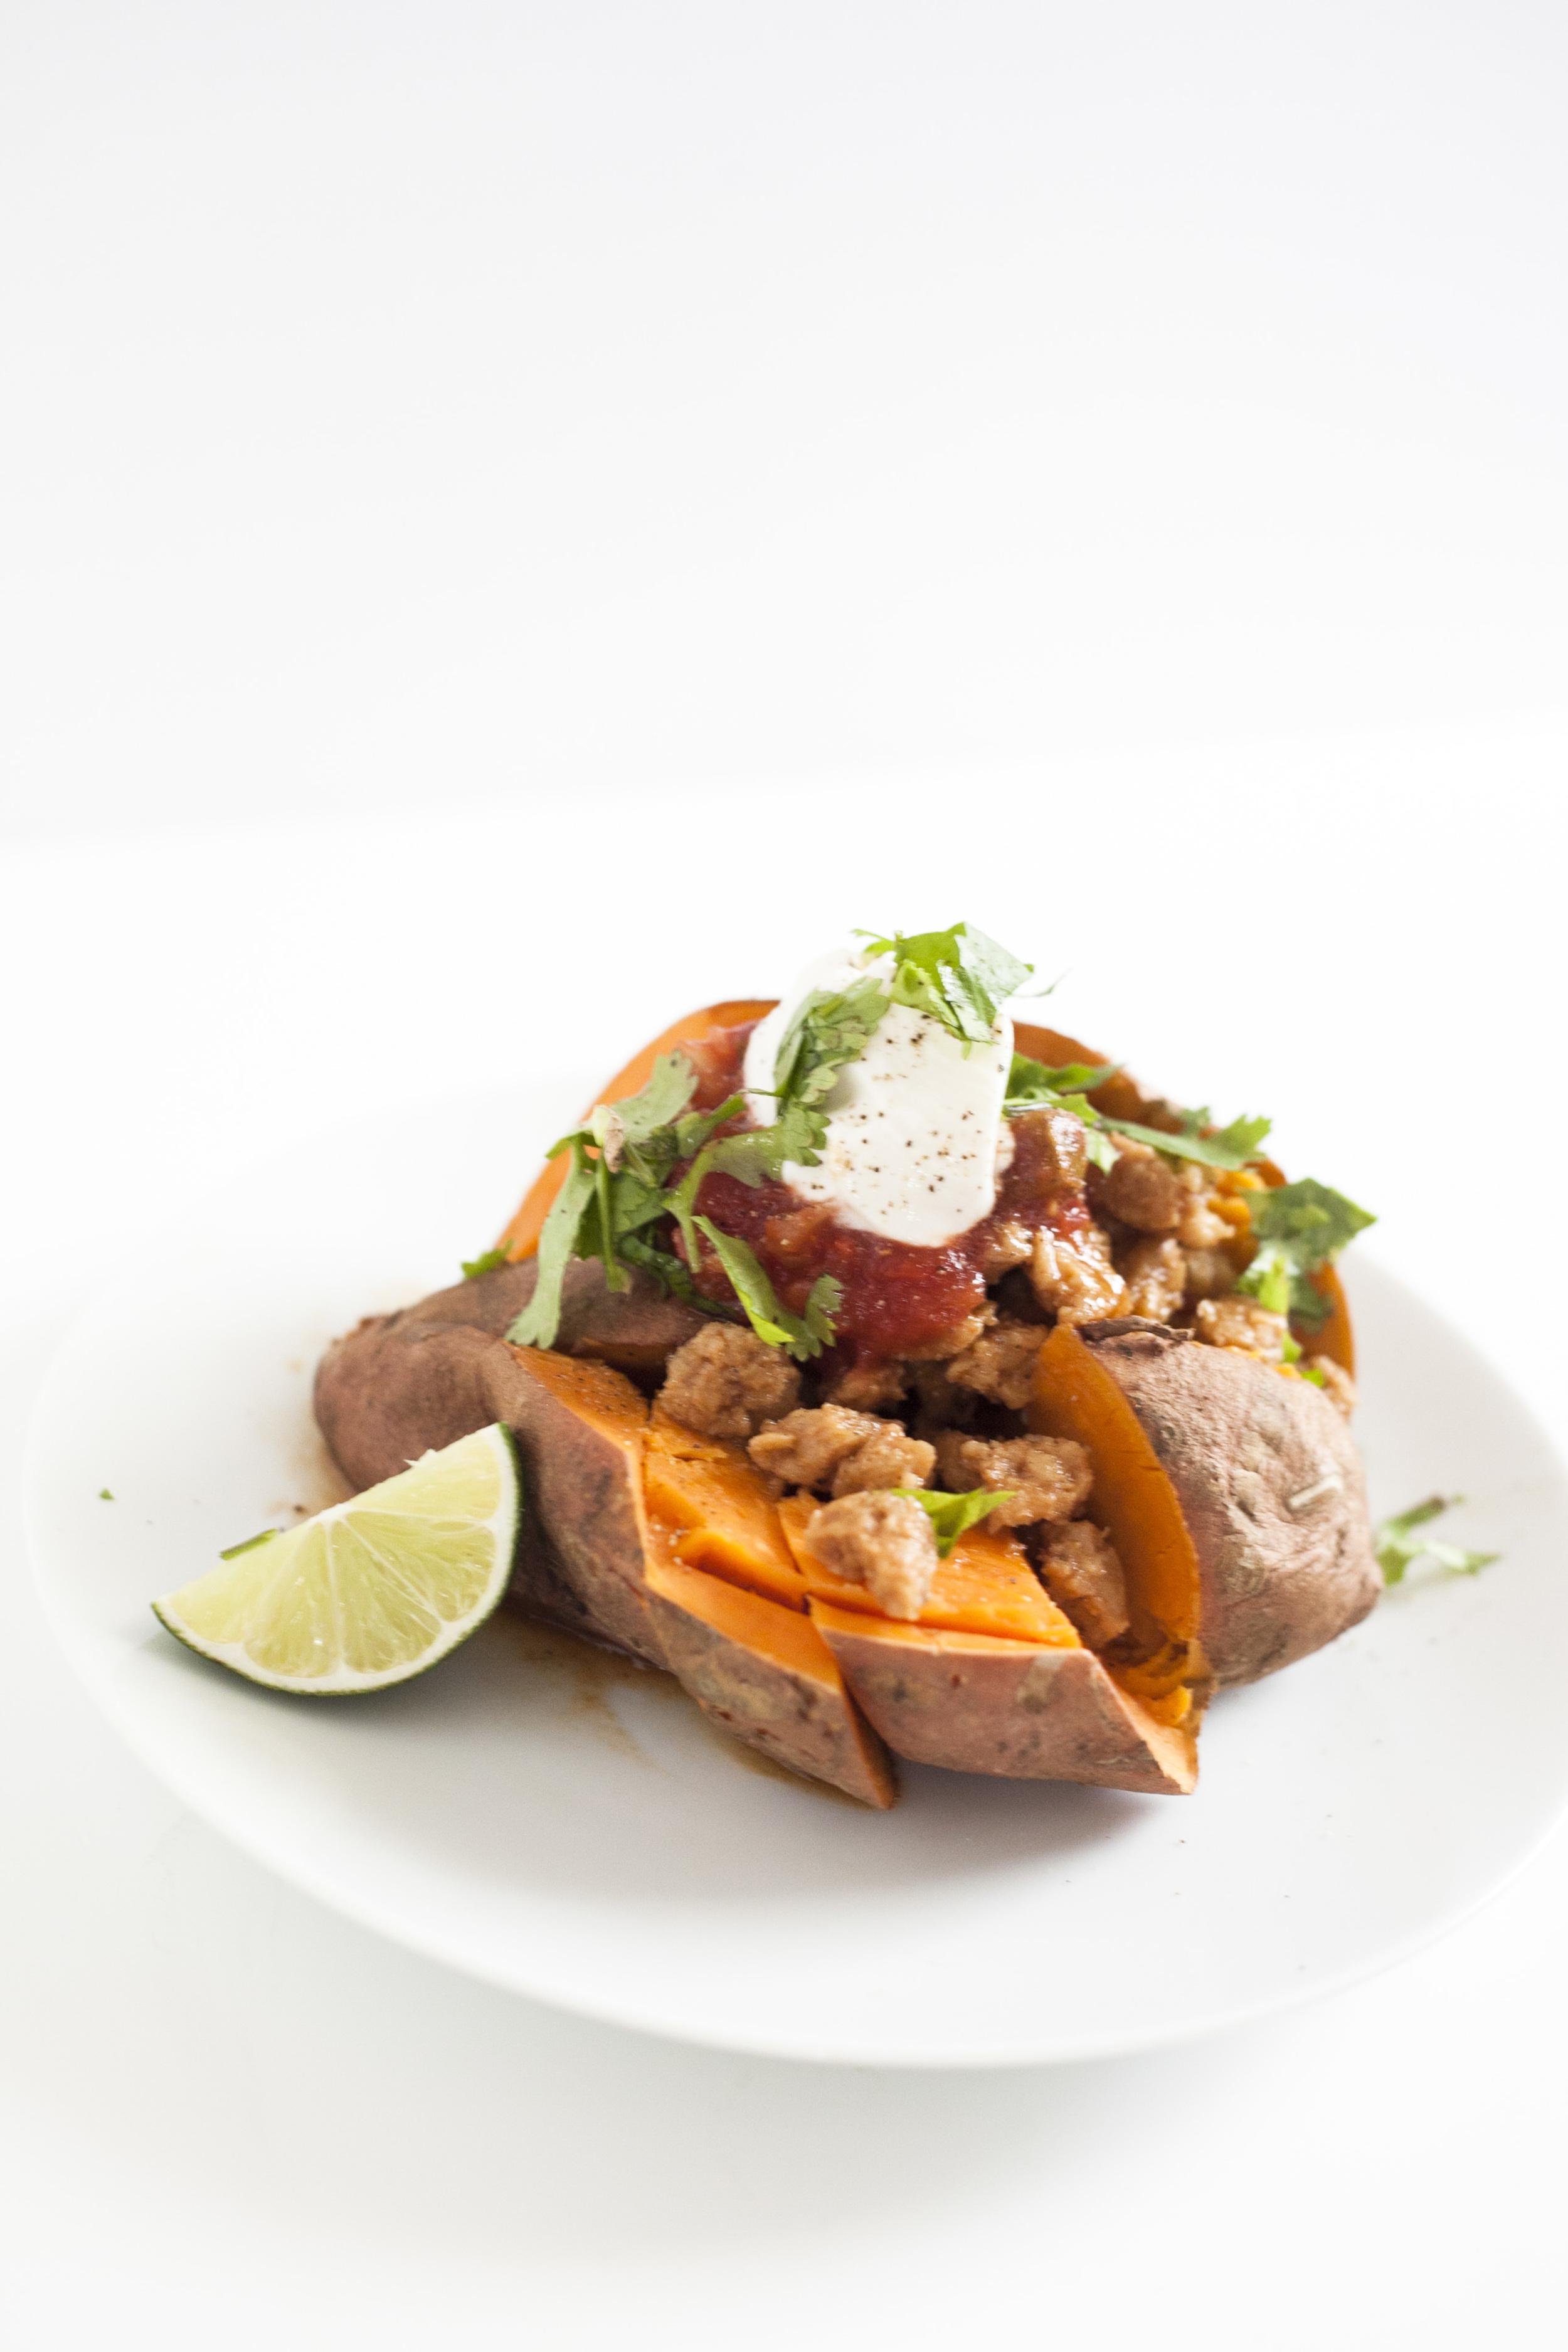 Soy Taco Stuffed Sweet Potatoes